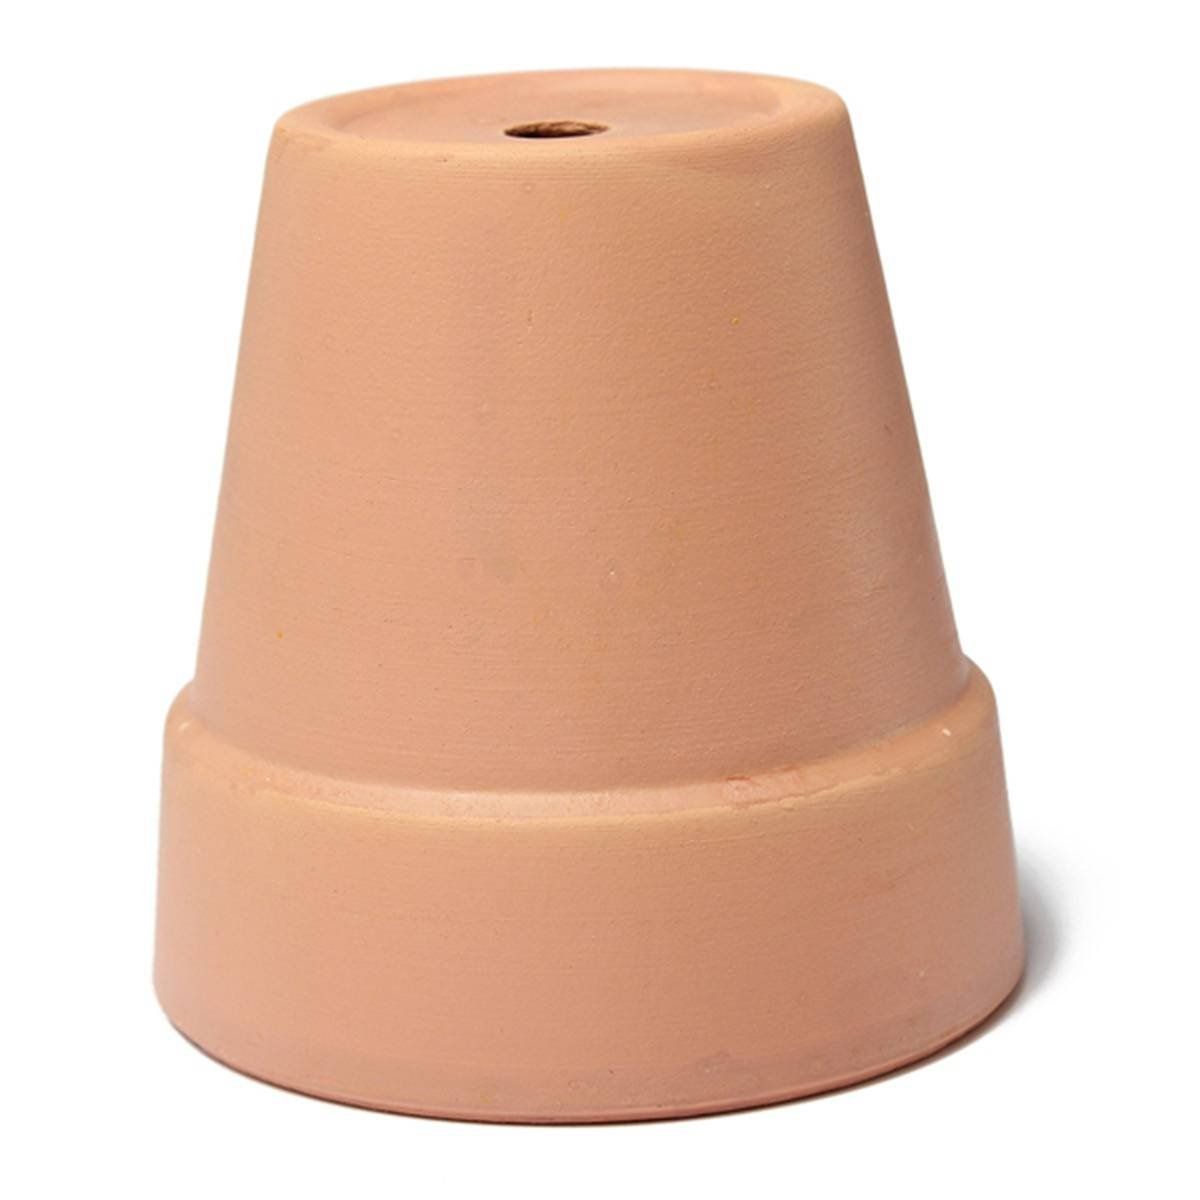 Terracotta Pot Clay Ceramic Pottery Planter Flower Pots Holder Home